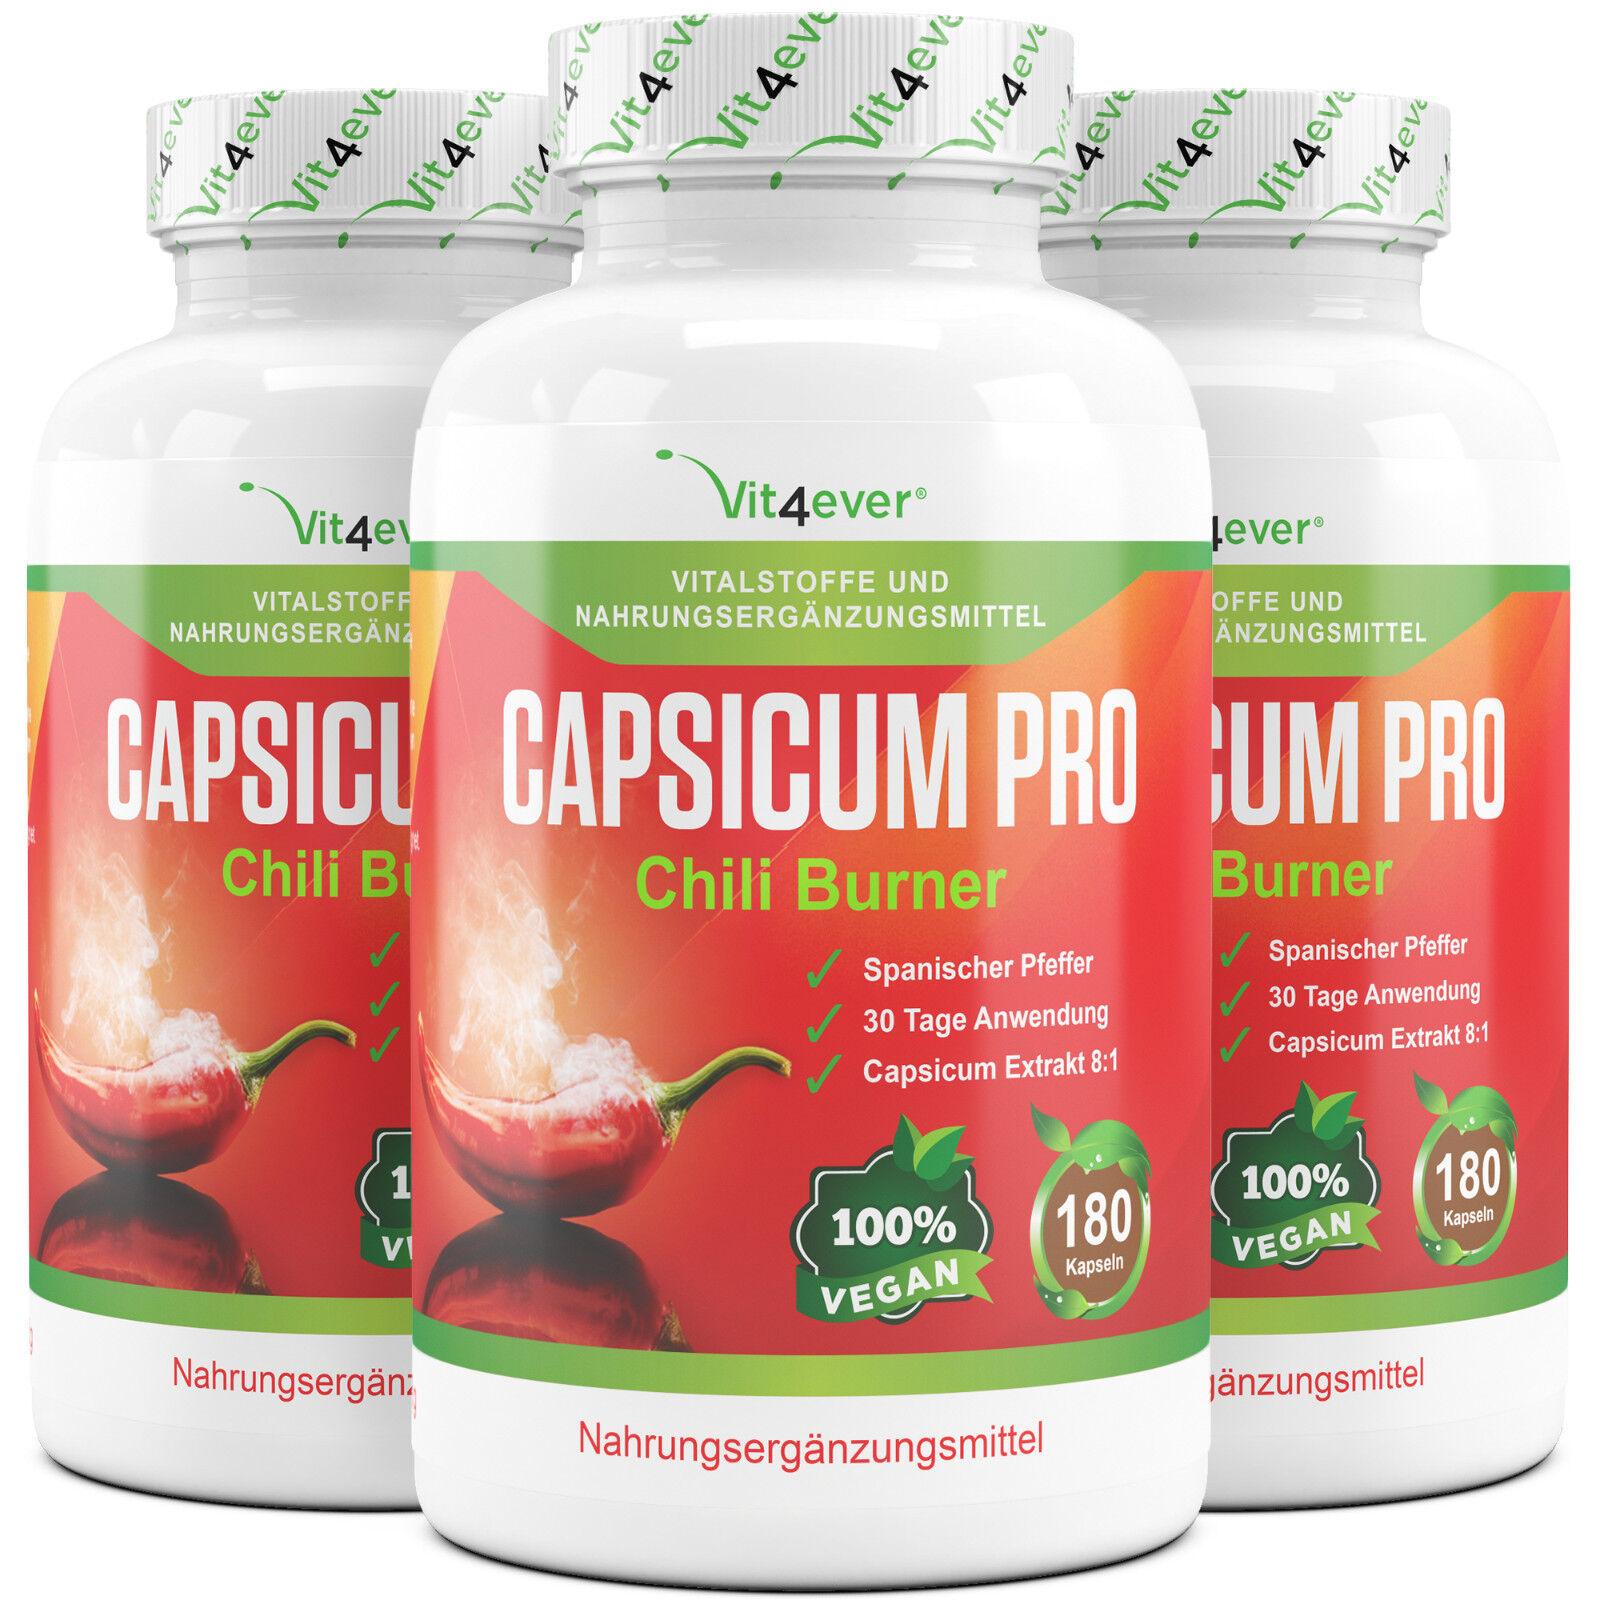 3x Capsicum Pro Natural Chili Fatburner = Abnehmen 540 Kapseln Abnehmen = - Diät - Vegan fb6a38